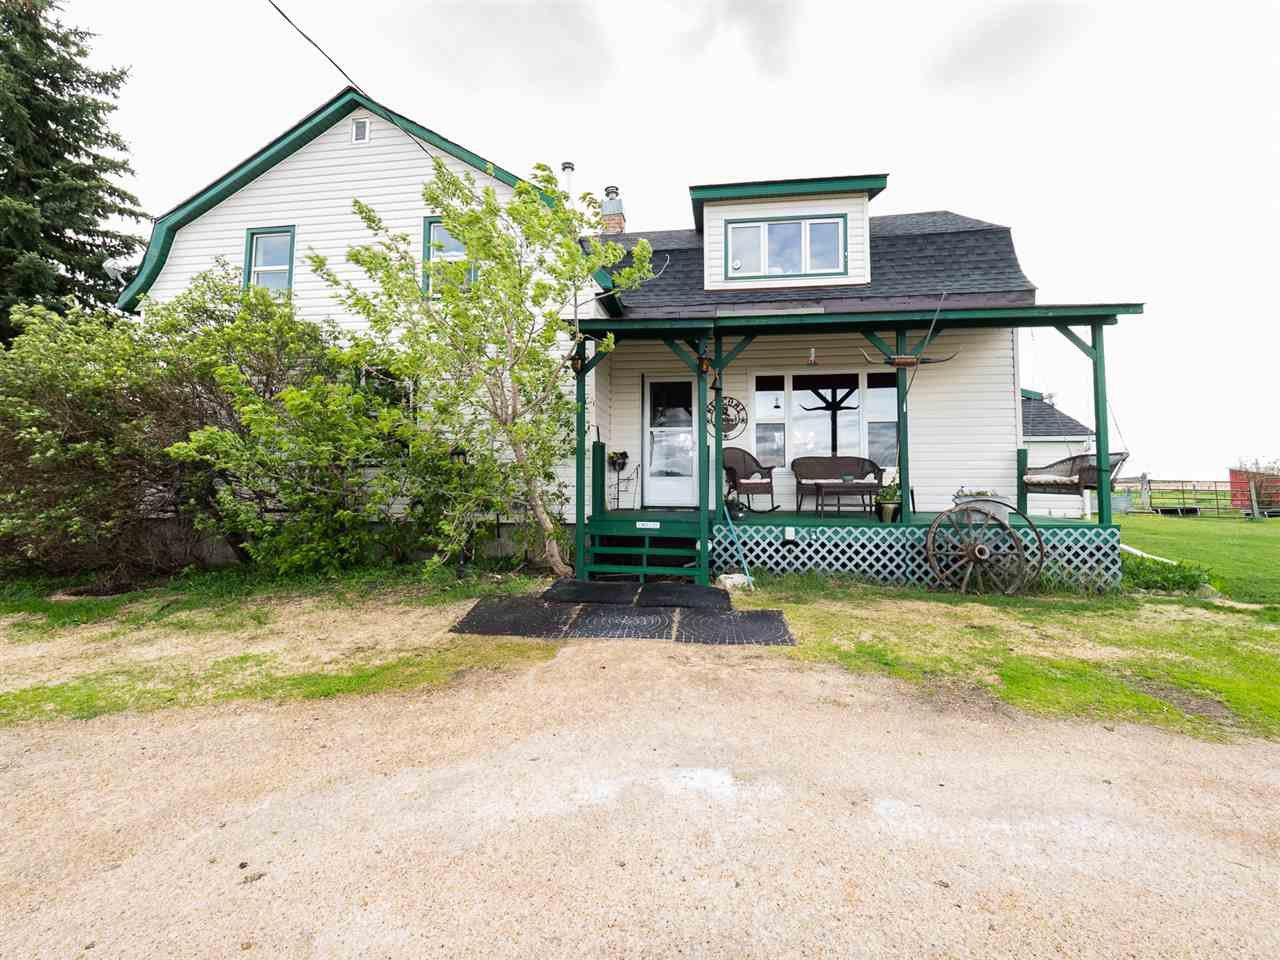 Main Photo: 55330 RGE RD 260: Rural Sturgeon County House for sale : MLS®# E4200329